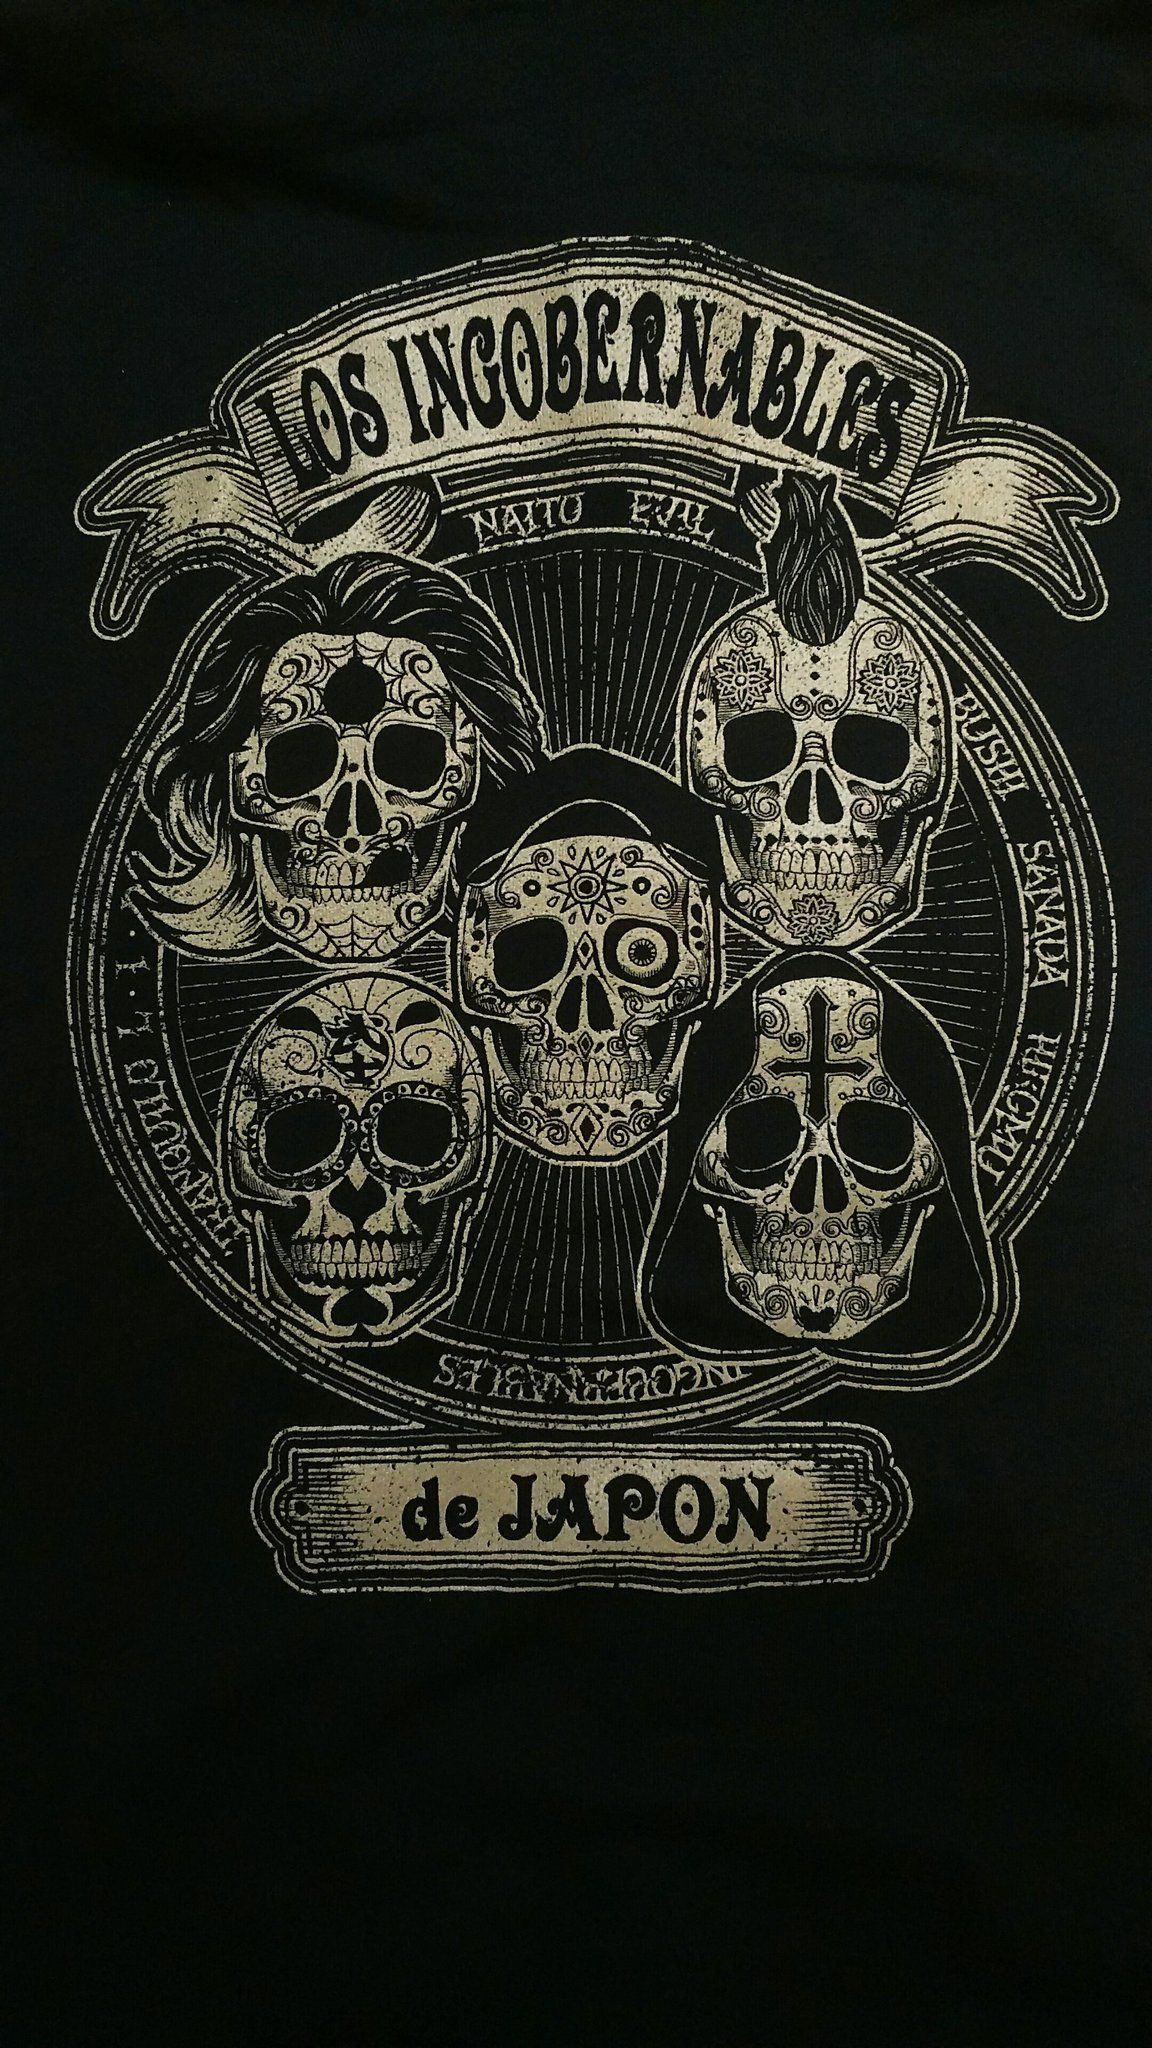 Pin By Vii Shade On Los Ingobernables De Japon Njpw Japanese Wrestling Wrestling Posters Professional Wrestling